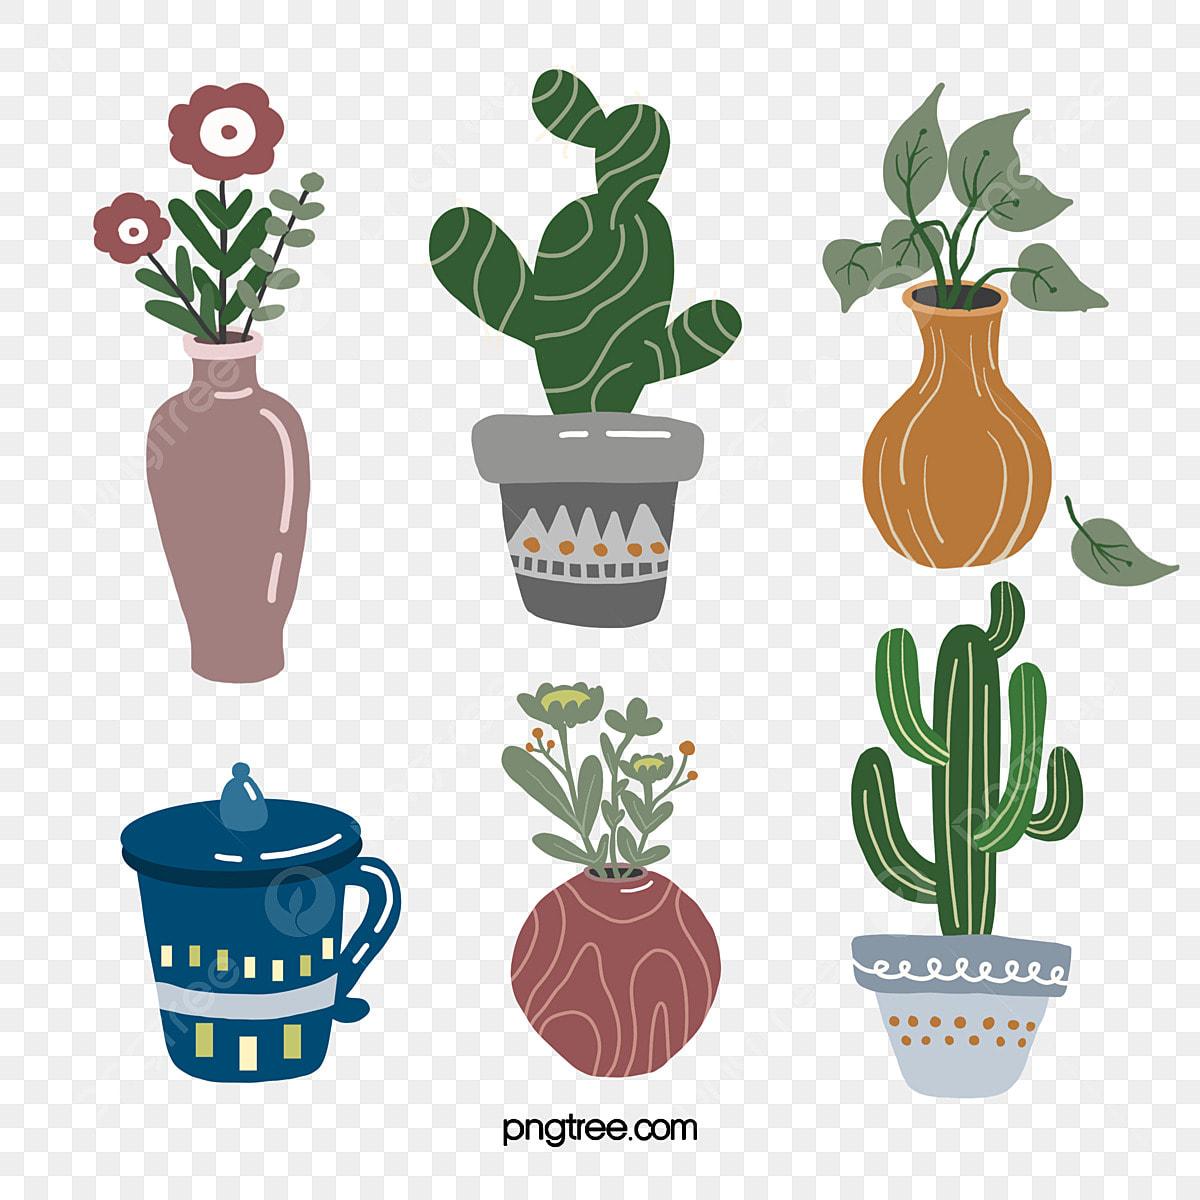 Plant Succulent Cactus Cup Morandi Decorative Sticker Cactus Succulents Plant Png Transparent Clipart Image And Psd File For Free Download